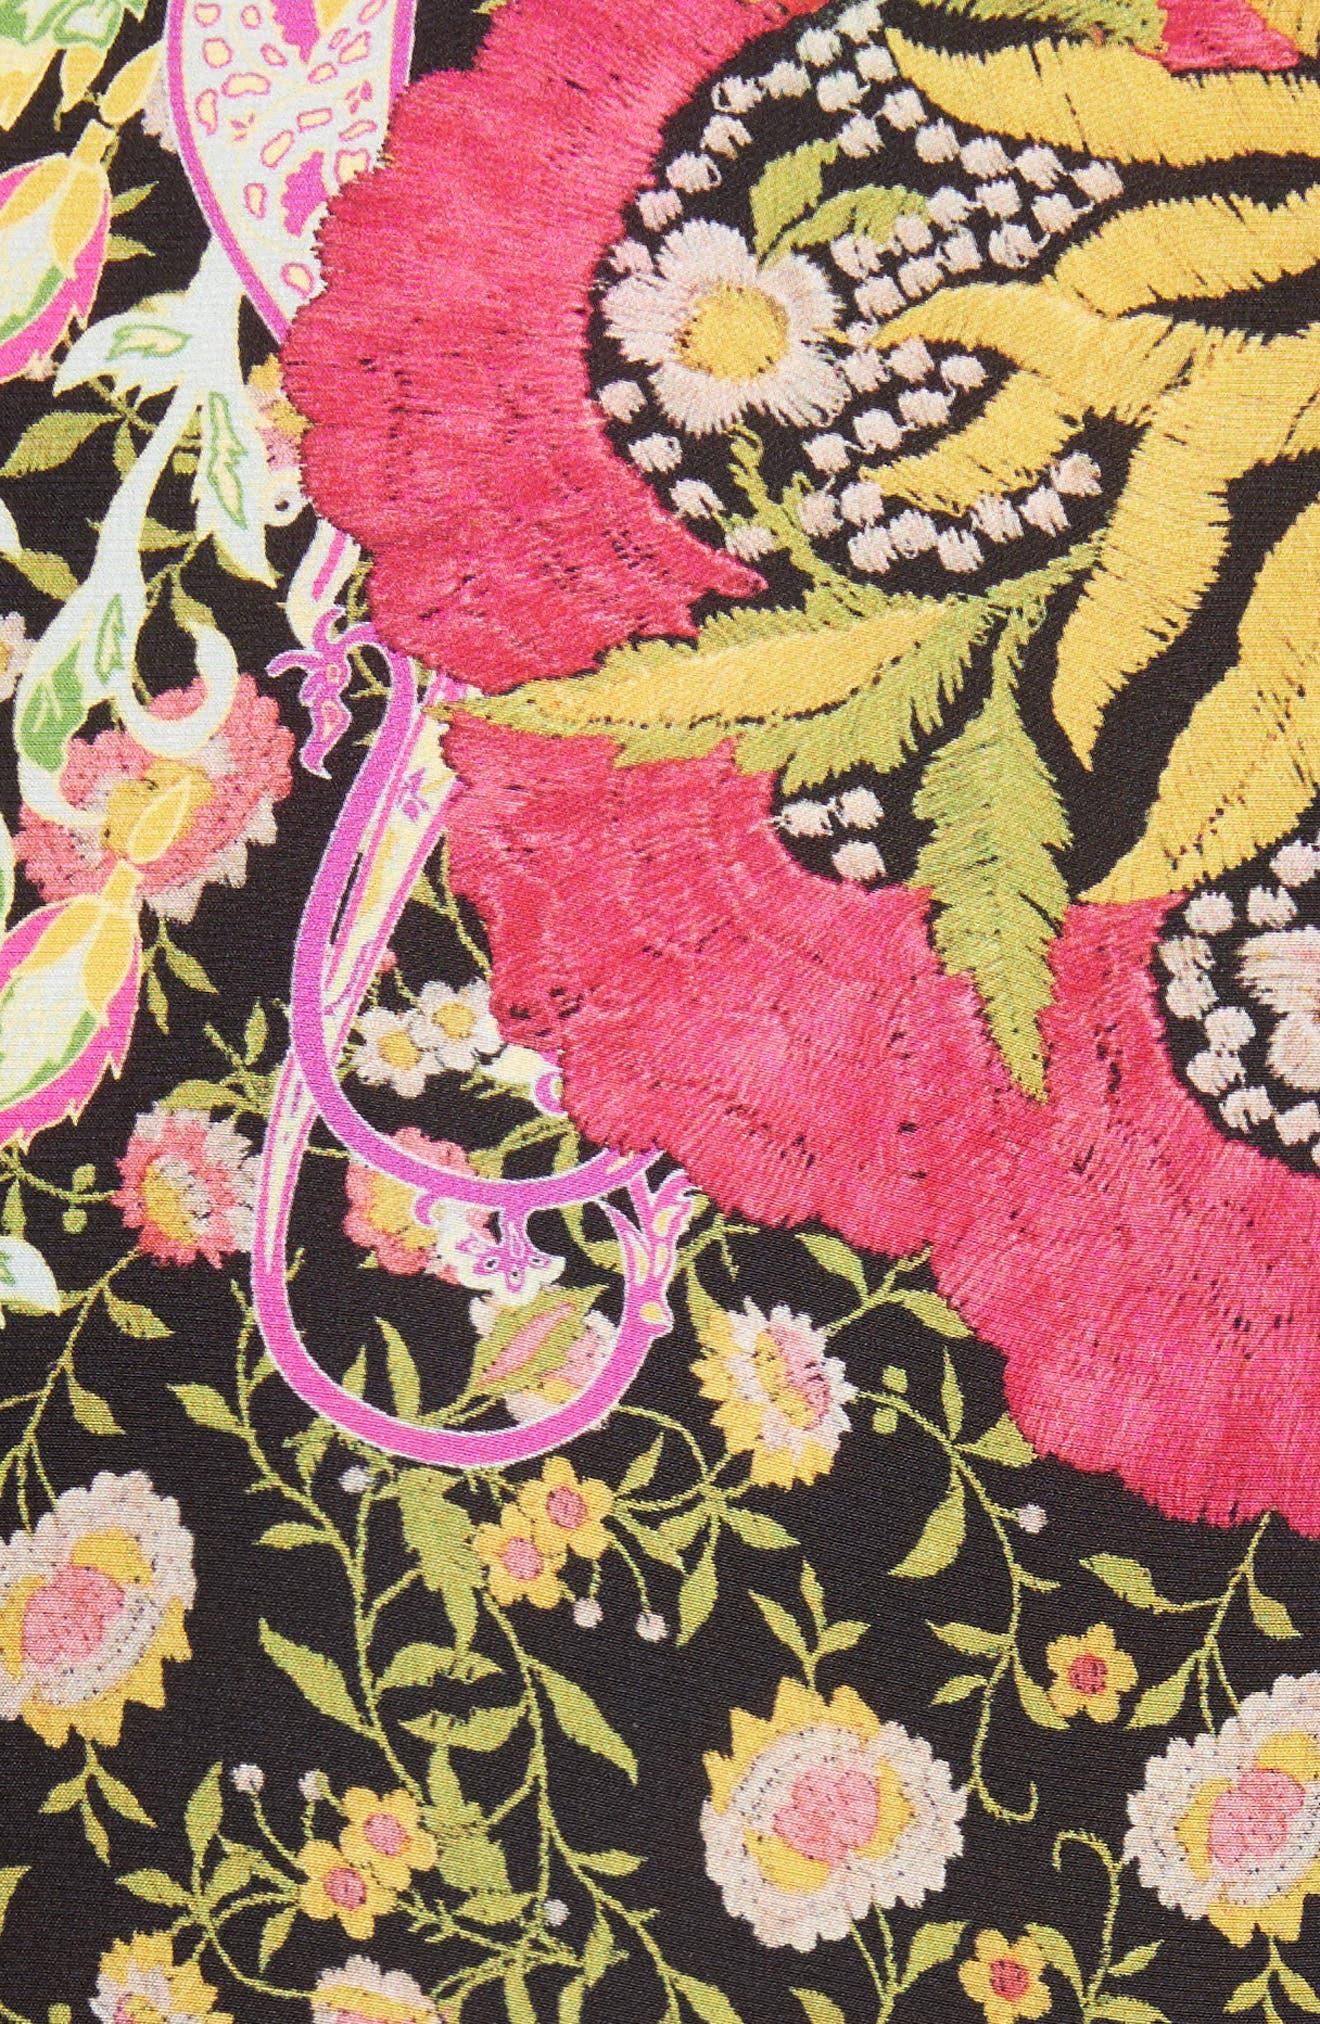 Floral Paisley Print Silk Shirt,                             Alternate thumbnail 5, color,                             001